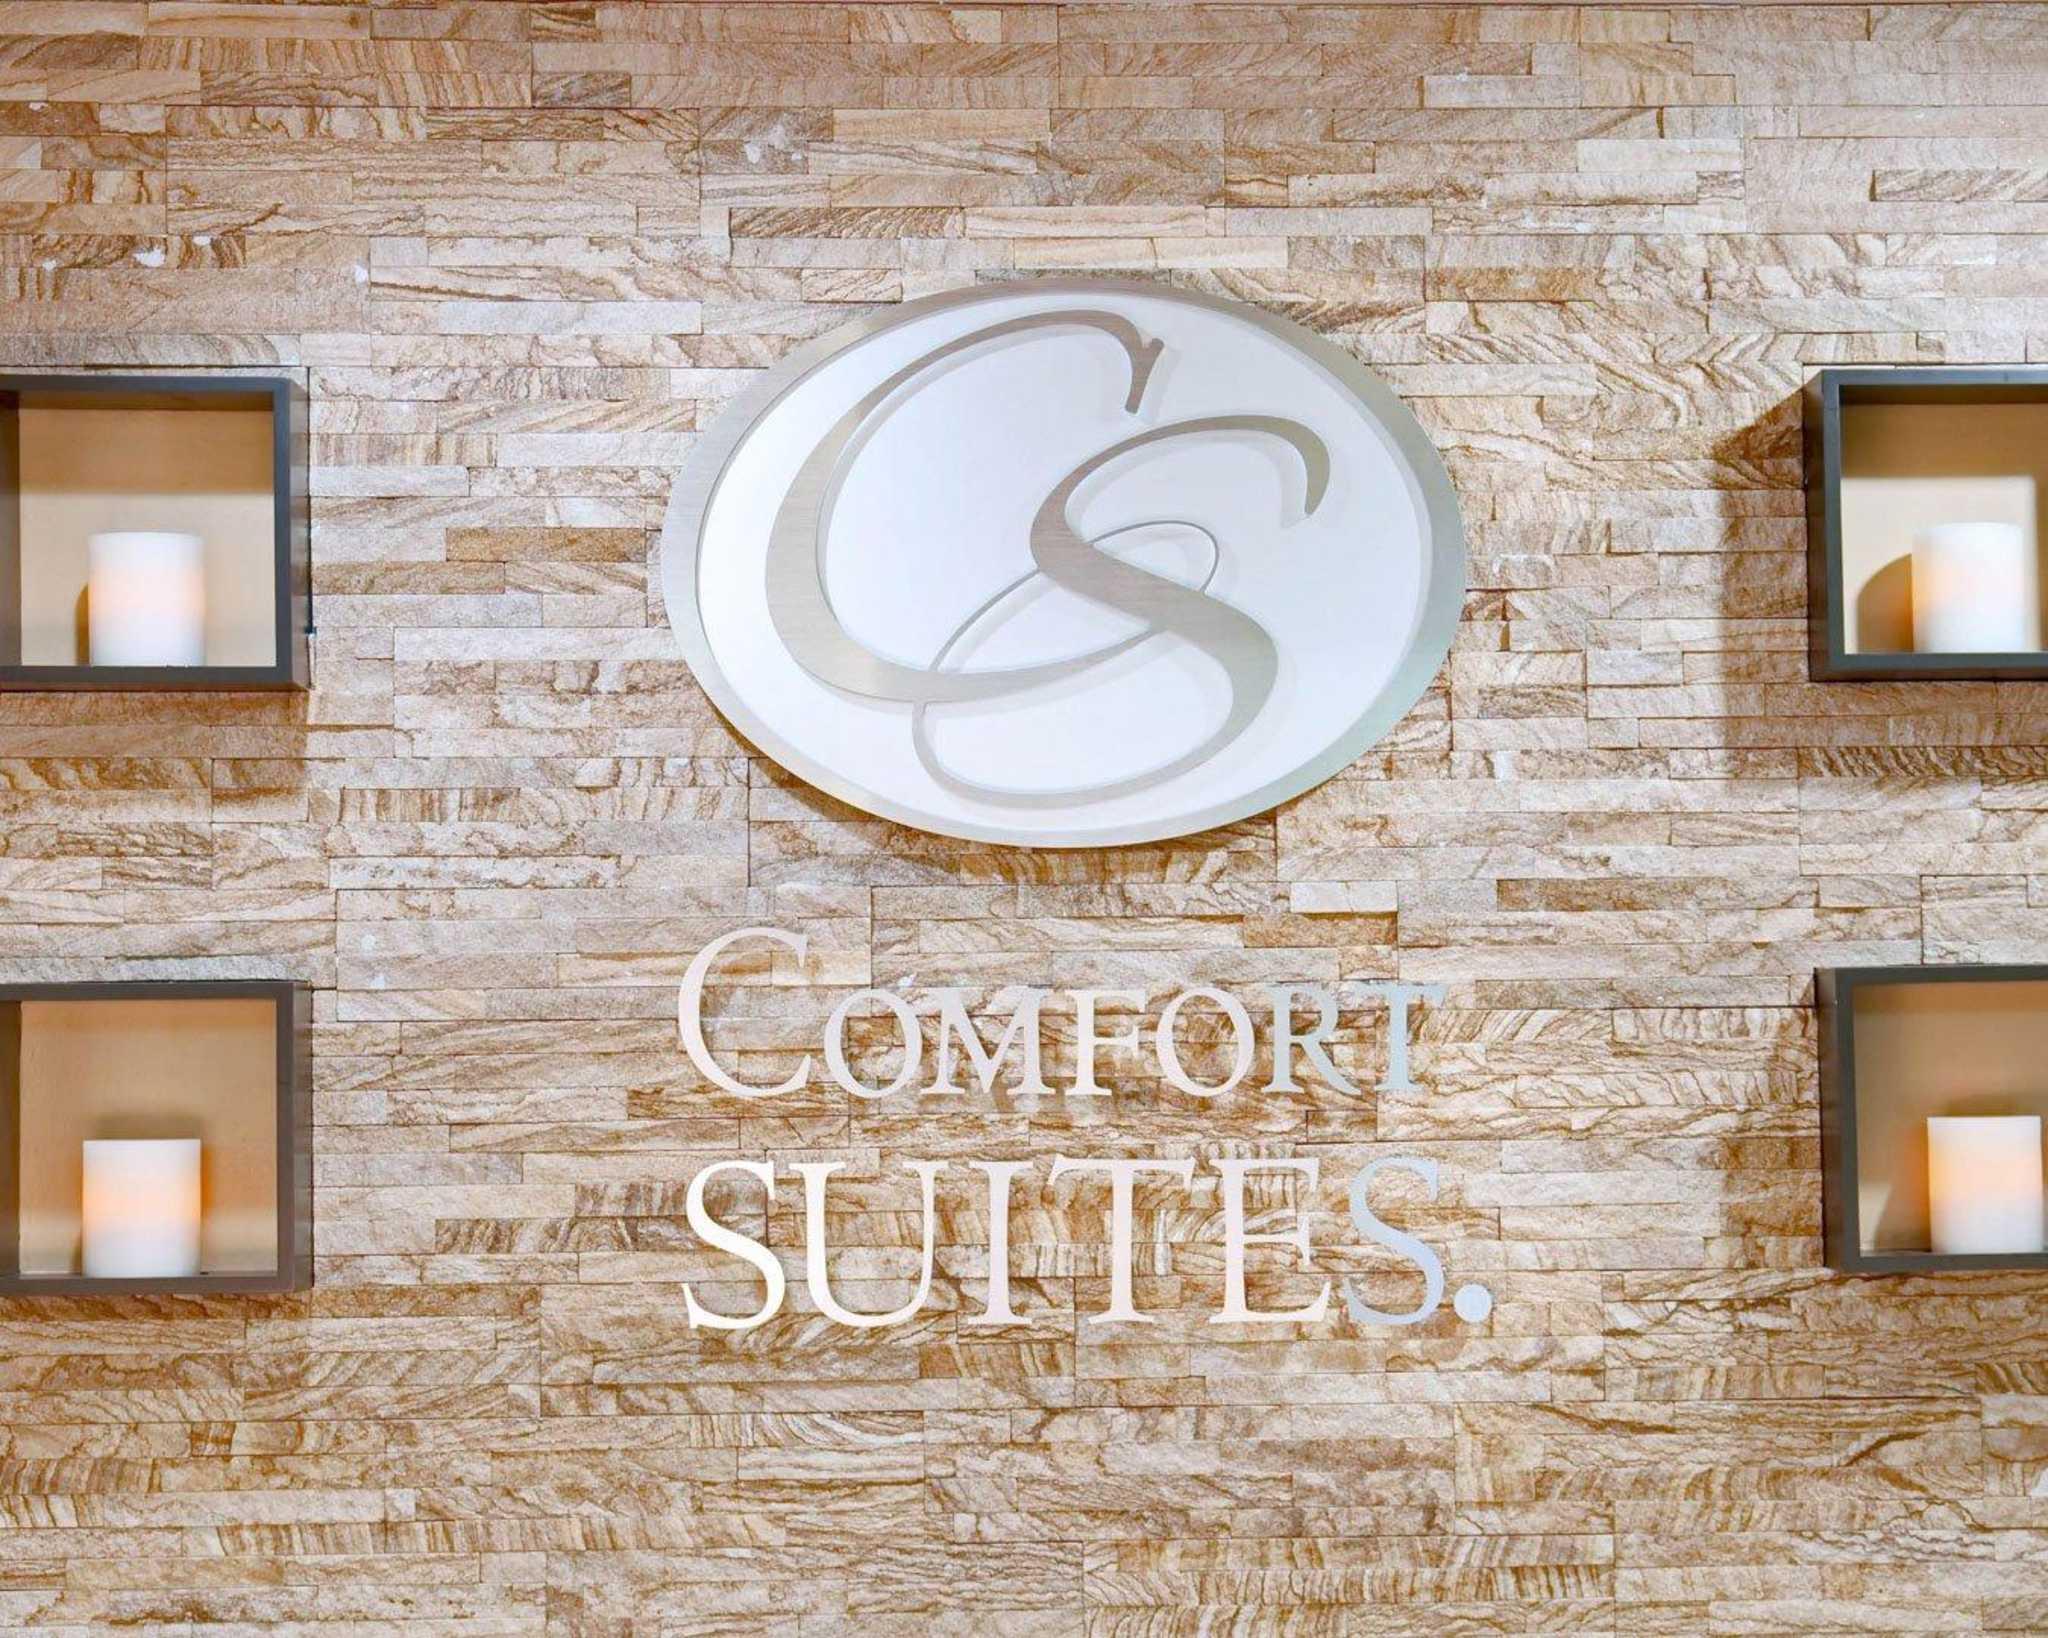 Comfort Suites Inn at Ridgewood Farm image 1